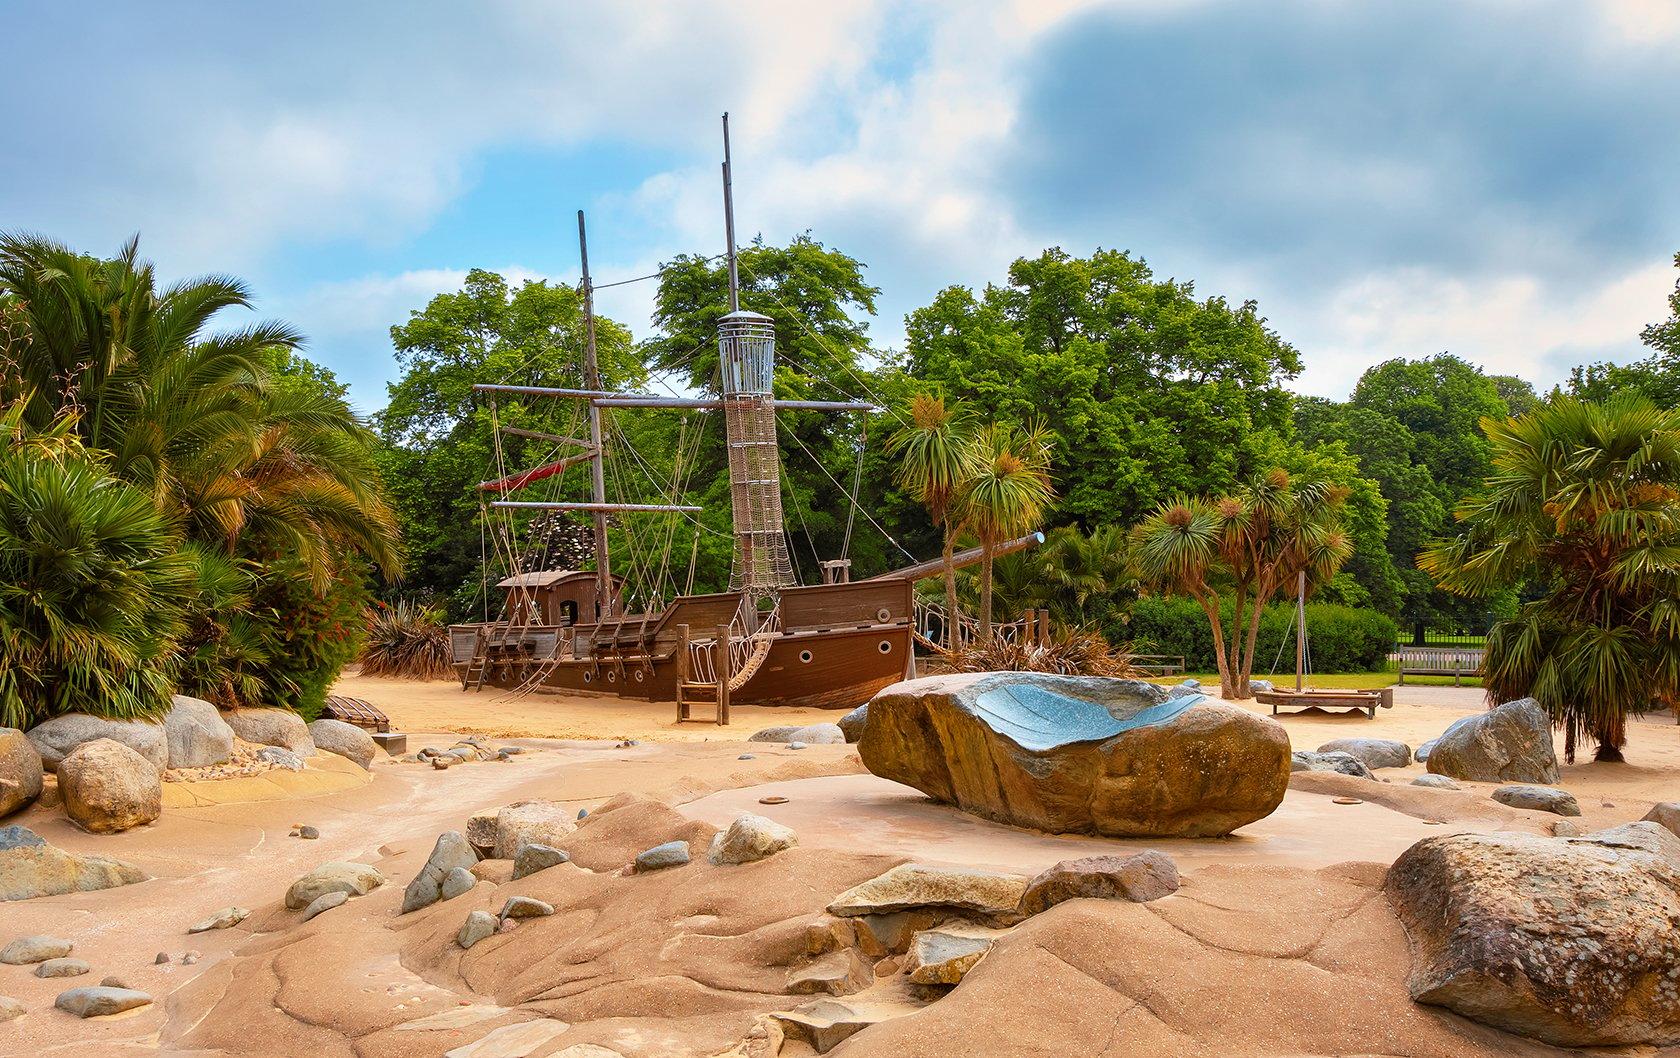 Pirate Ship at the Diana Memorial Playground